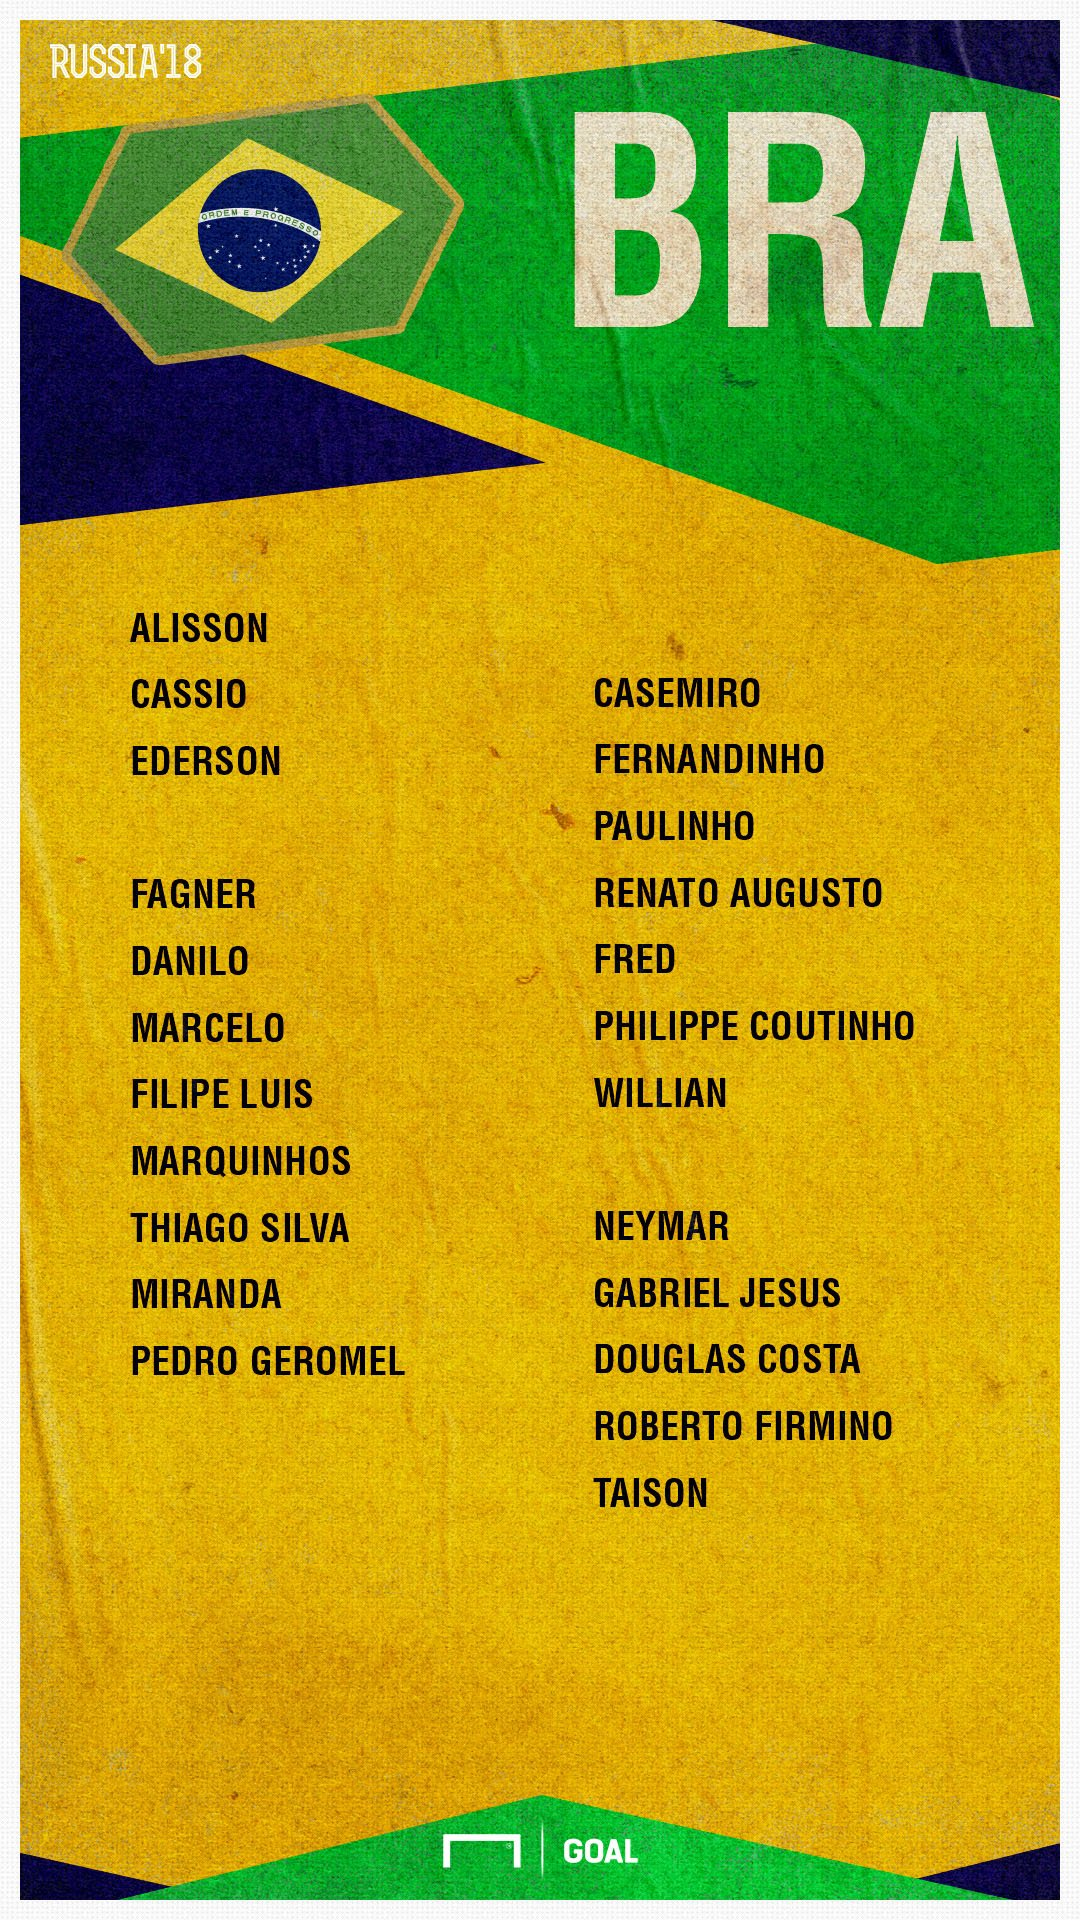 DdLLtmAW0AILiMw - Firmino, Willian, Neymar, Marcelo included in Brazil 's 23 Man World Cup Squad